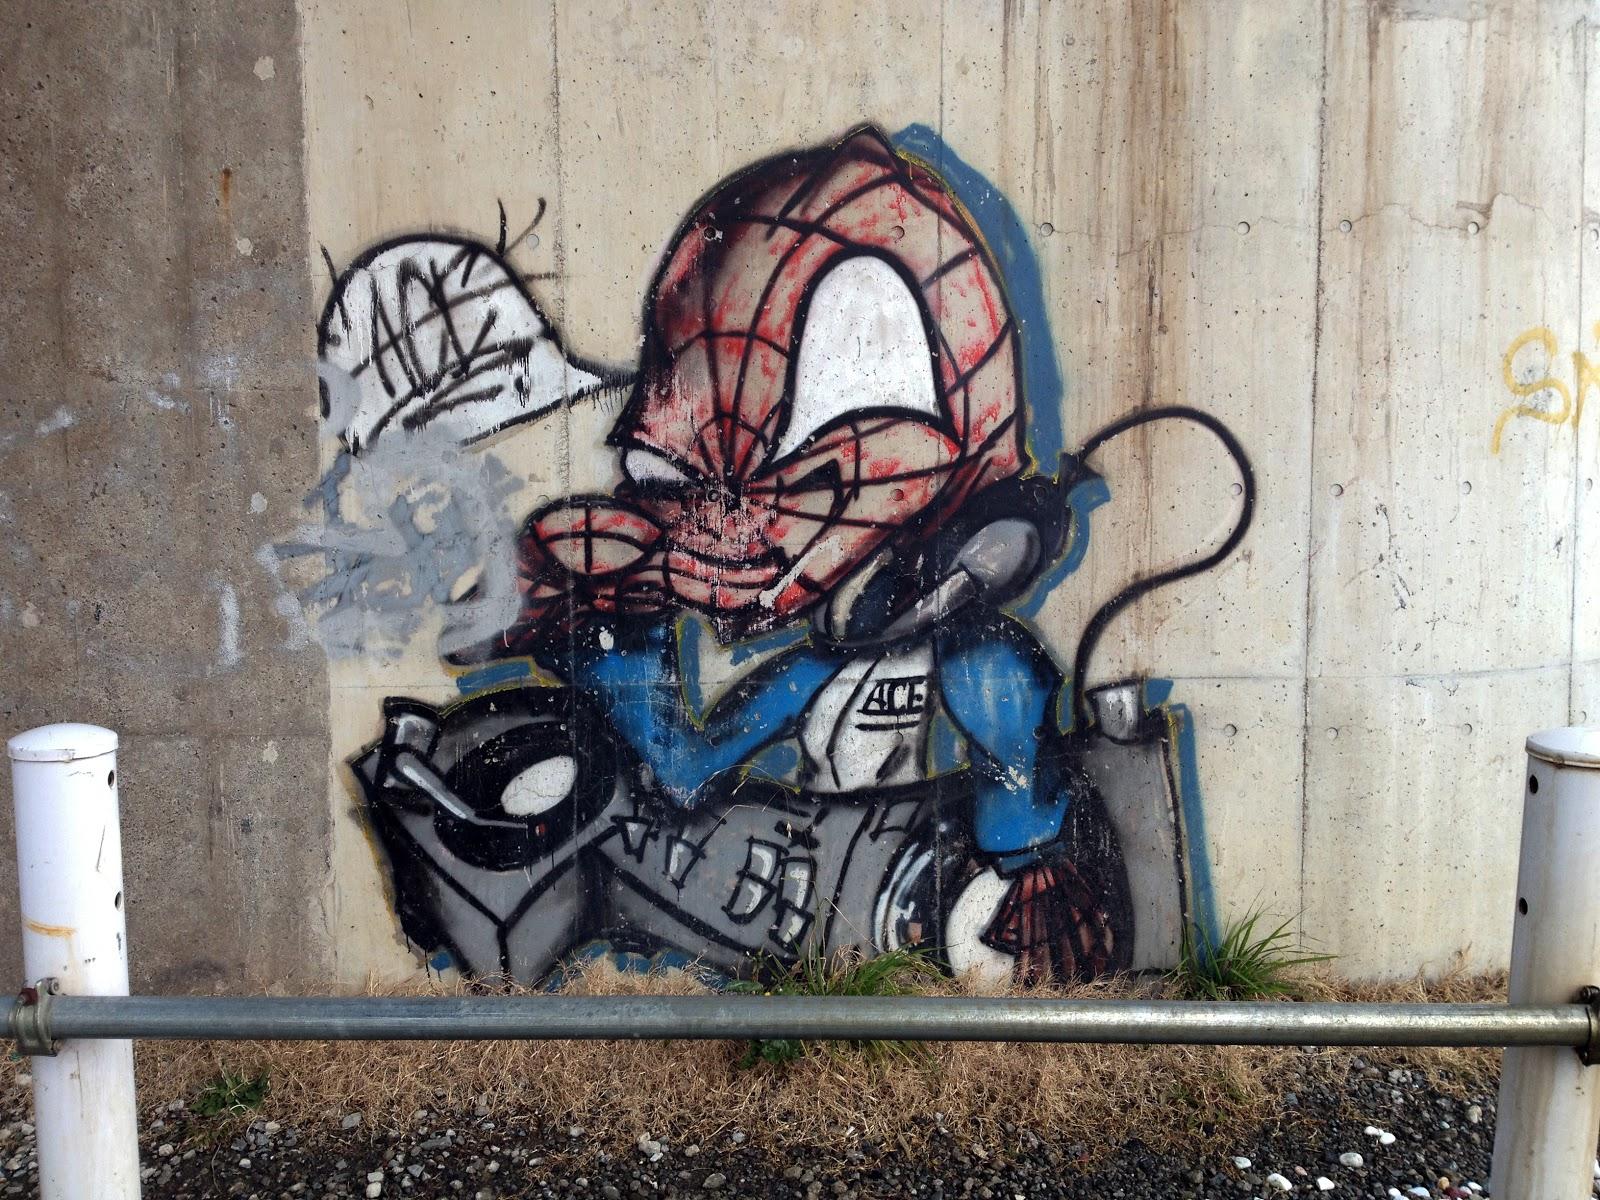 Graffiti wall tokyo - Graffiti Art From Nyc Streets To Tokyo Bridges